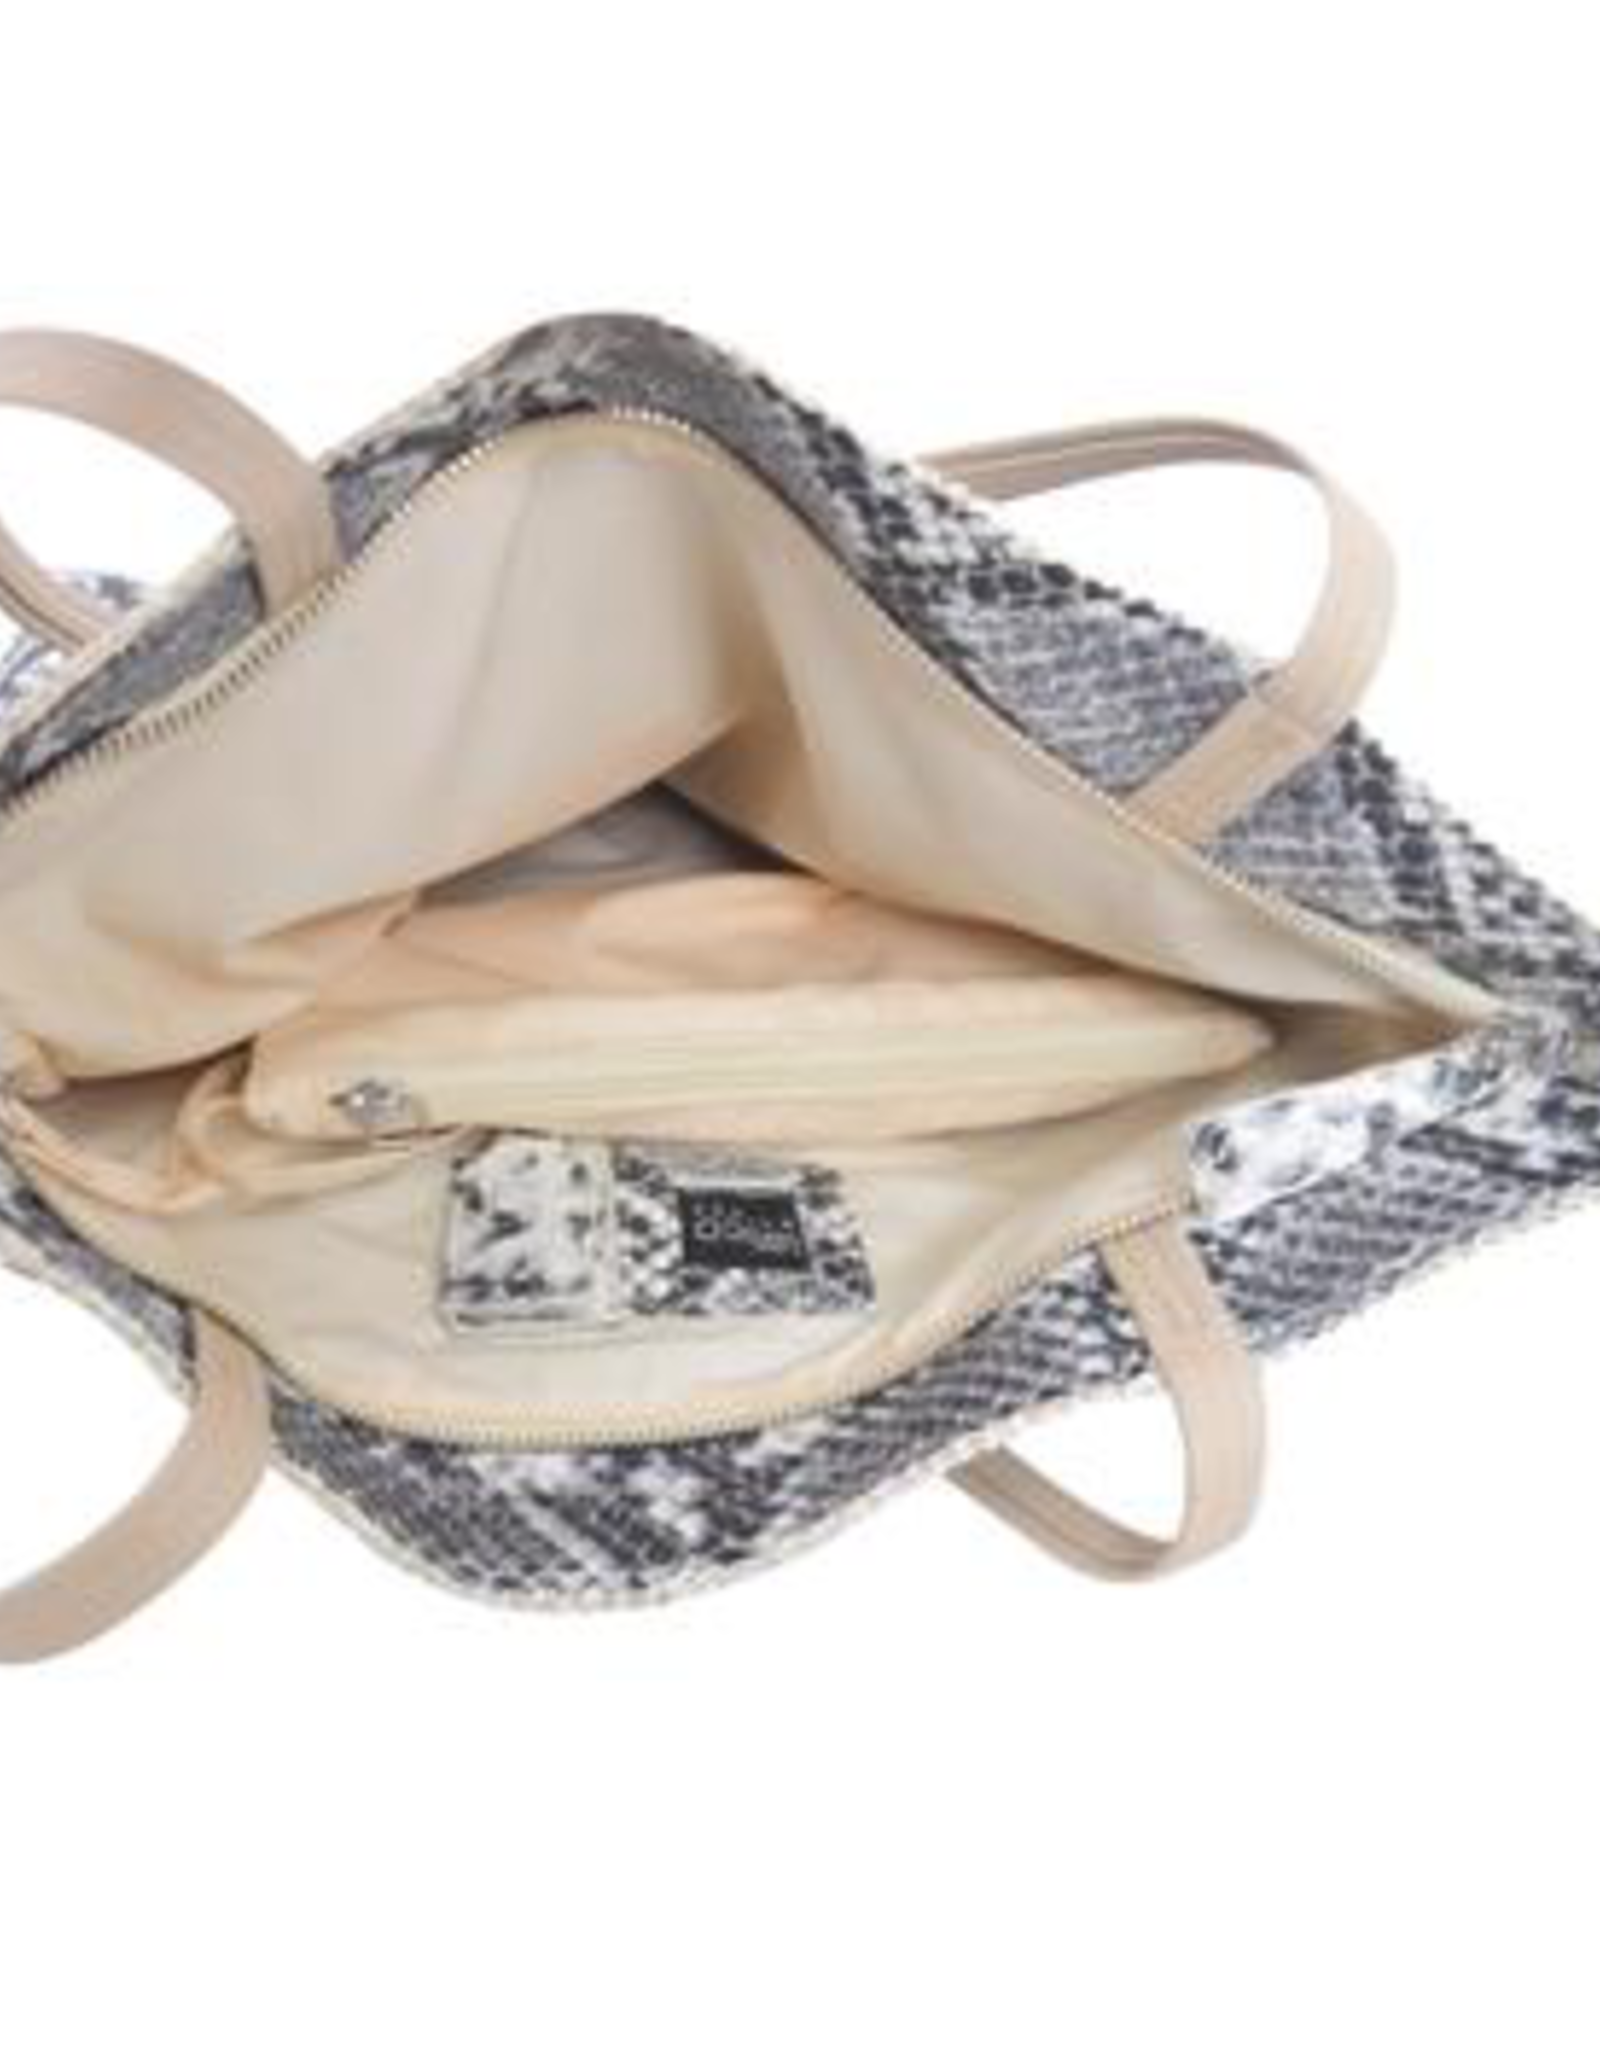 Latico Leathers Latico Leathers Esamy Bag